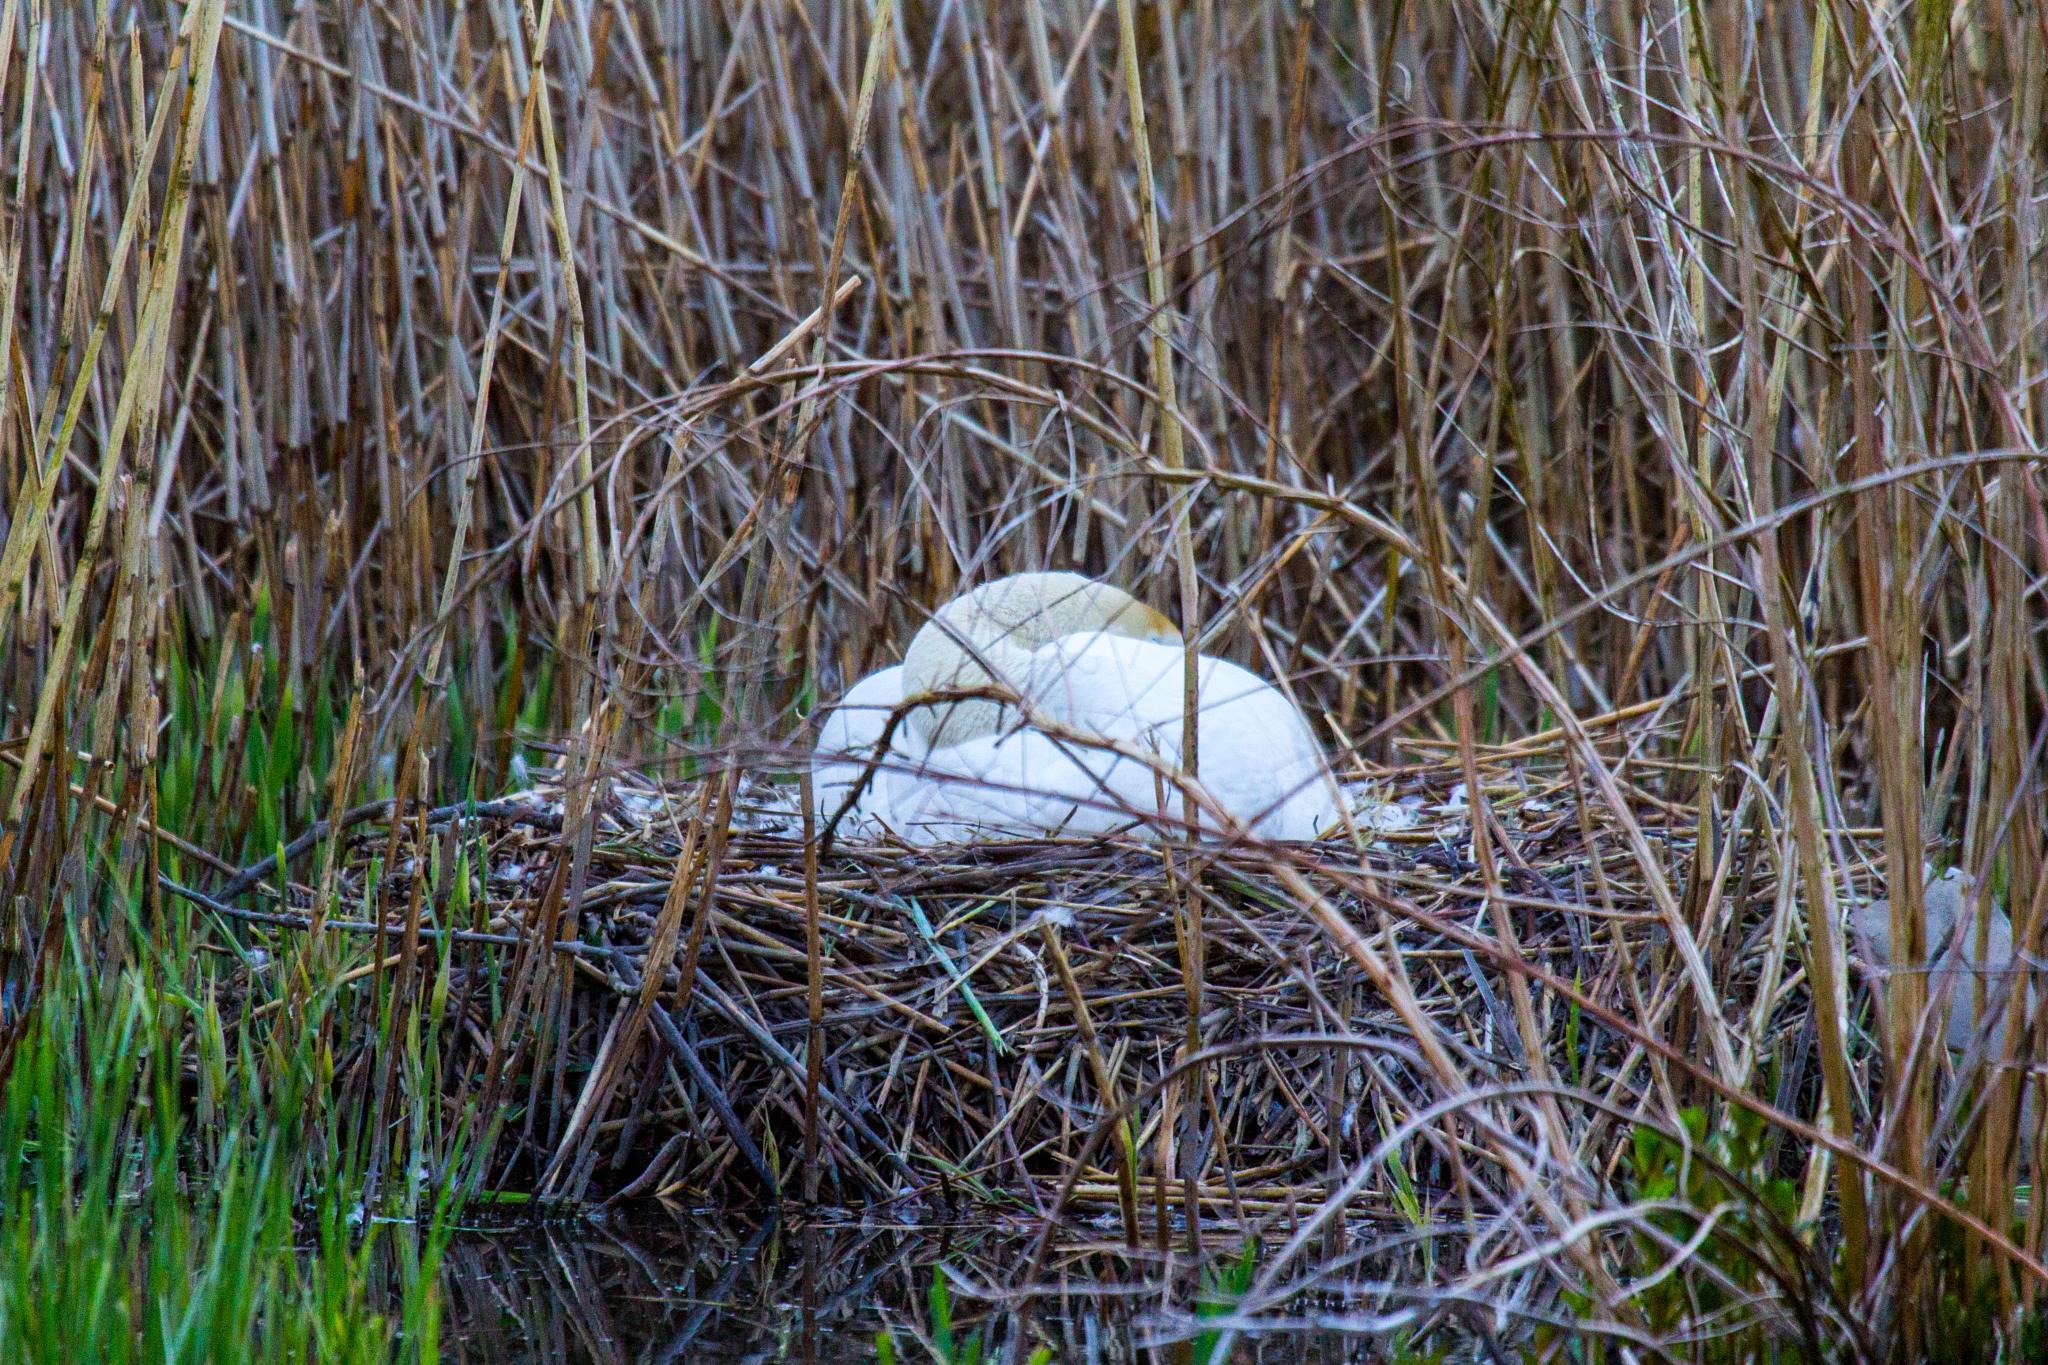 swan on her nest  by eddie.powell.9809